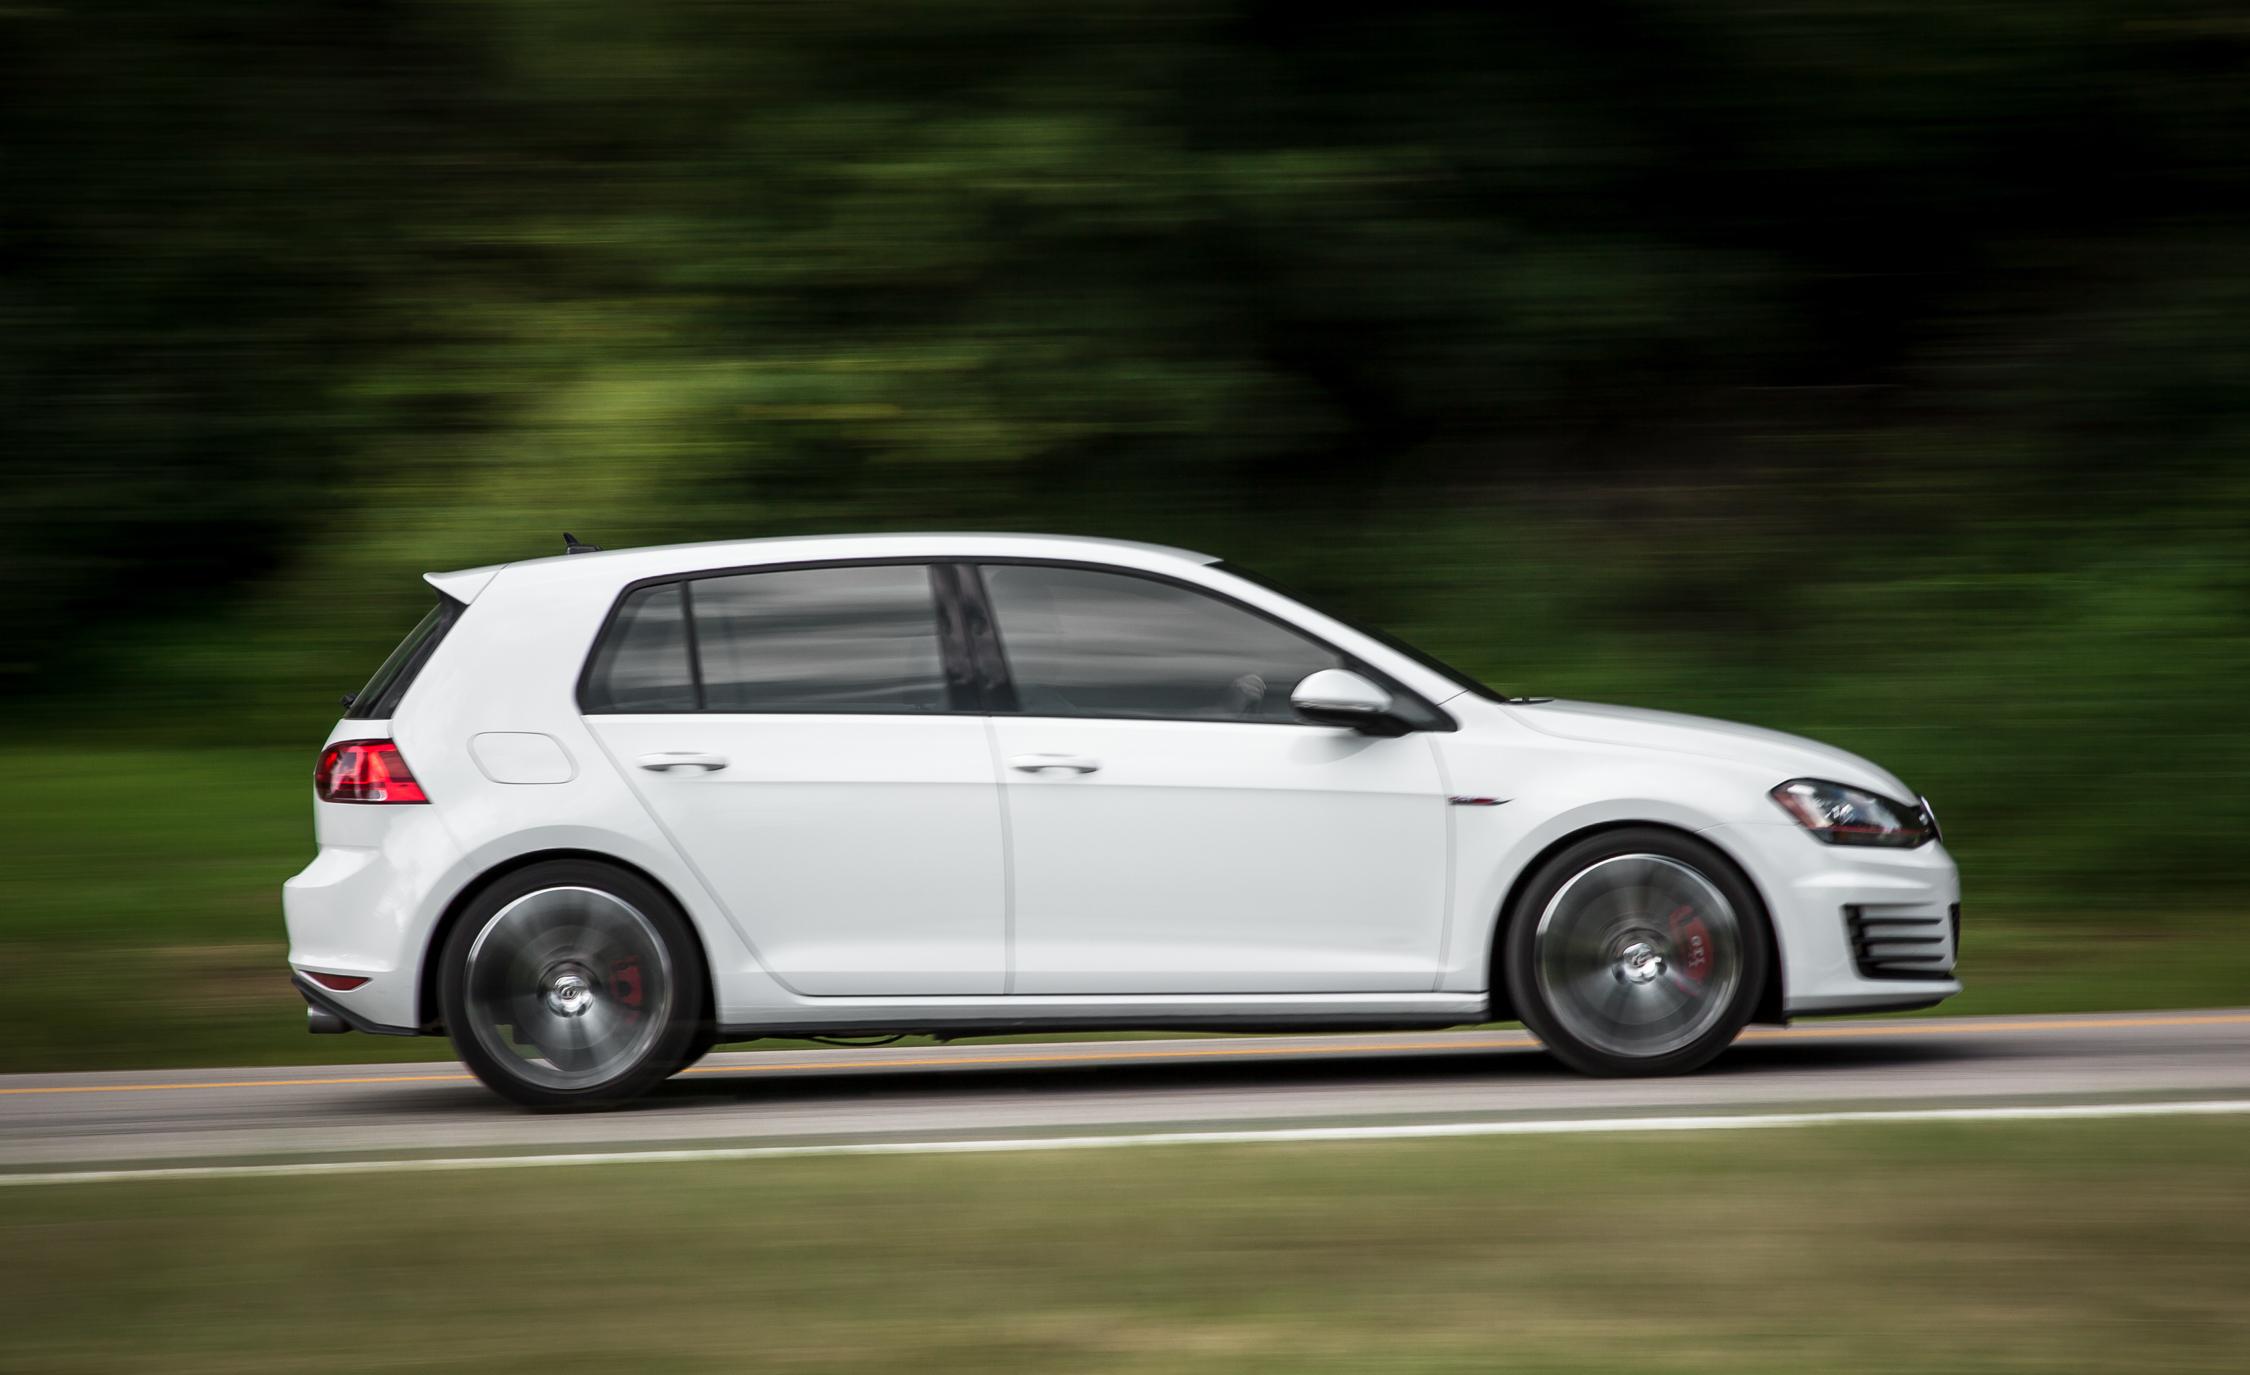 2015 Volkswagen GTI Test Side View